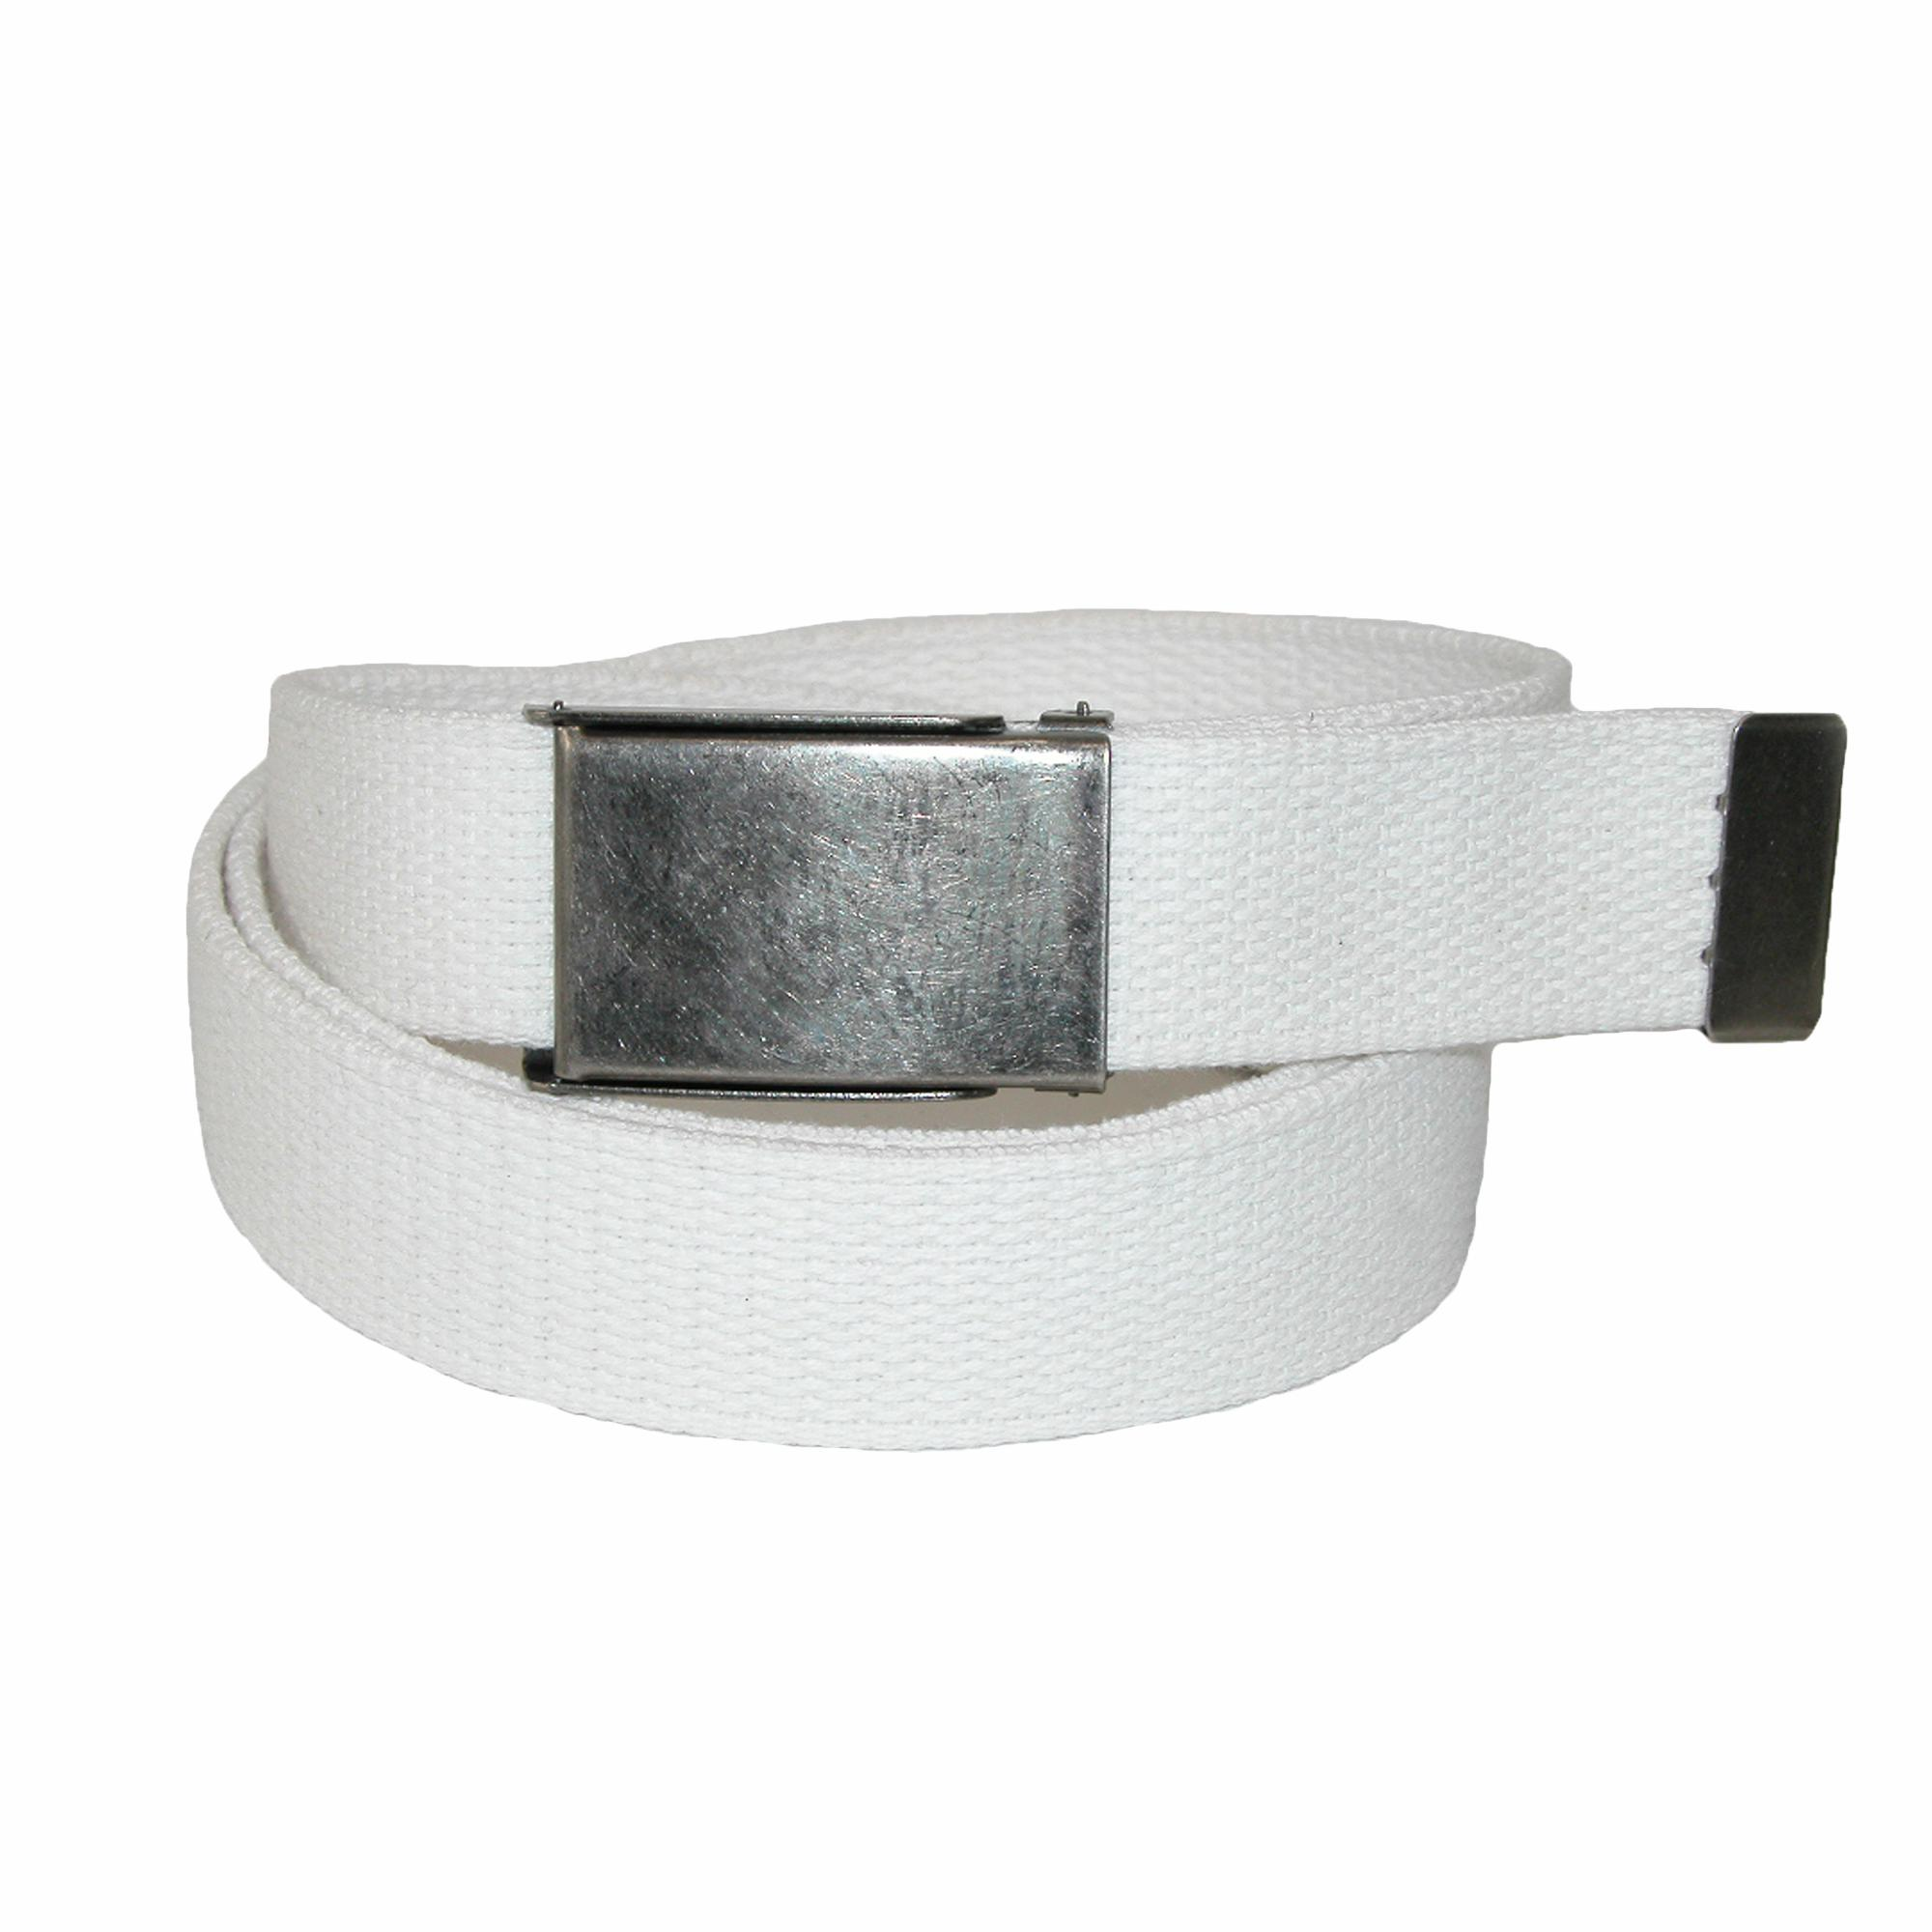 Ctm Mens Big & Tall Belt With Flip Top Nickel Buckle (pack Of 3)